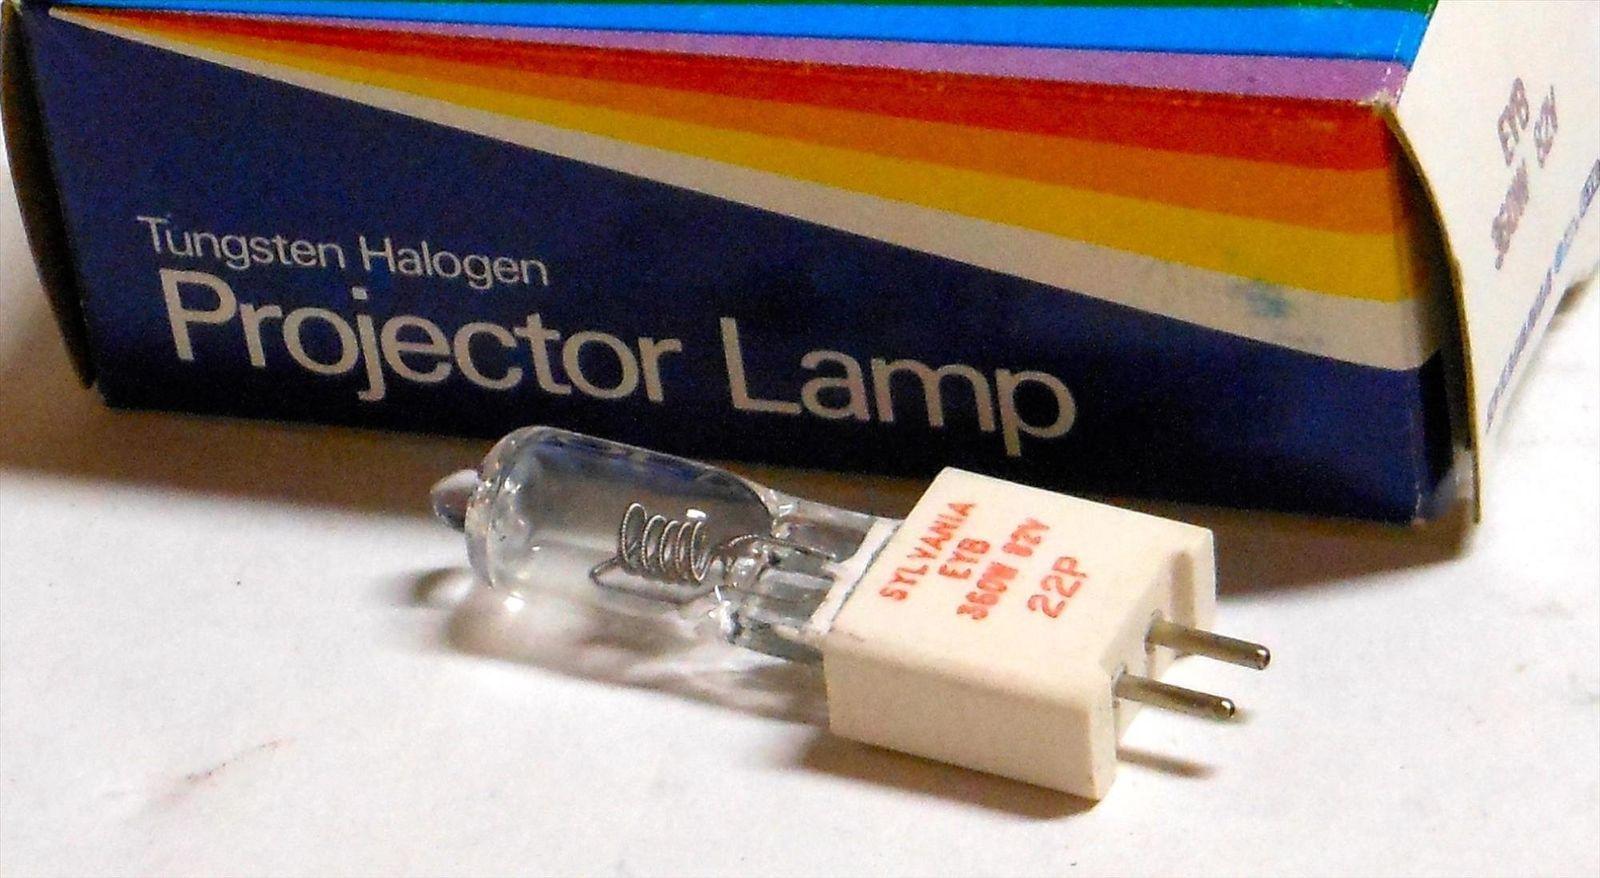 NEW Sylvania EHA 500W 120V Tungsten Halogen Projector Lamp Bulb  *FREE SHIPPING*